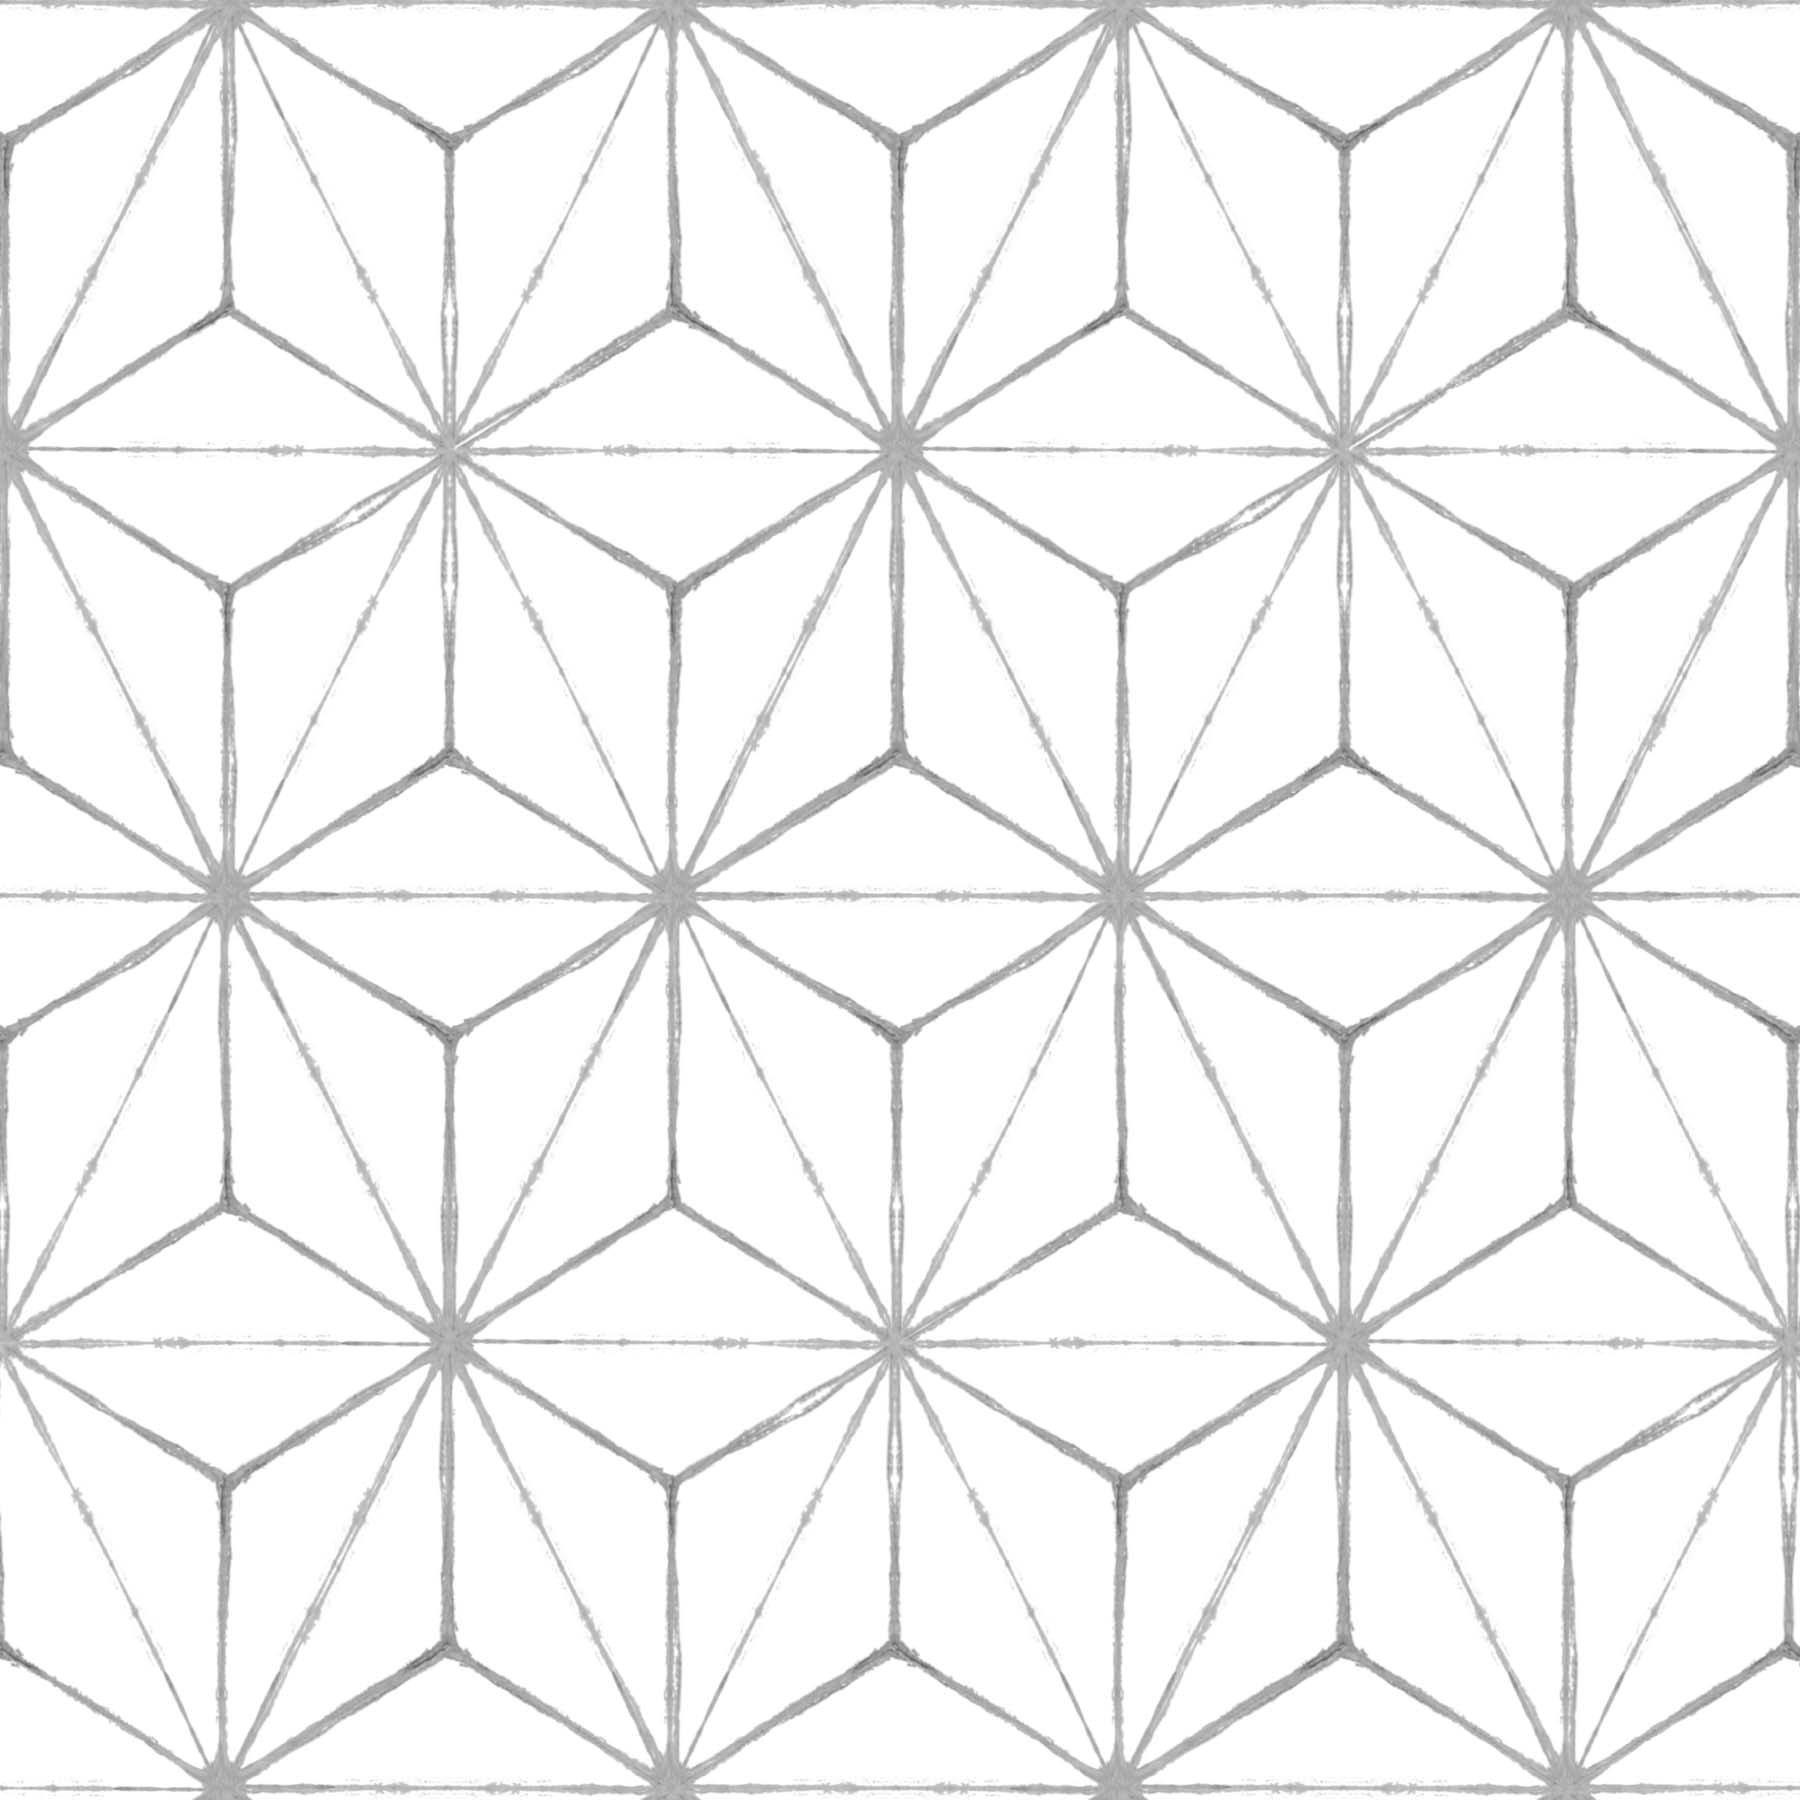 FloorPops FP2481 Kikko Floor Decal, White by FloorPops